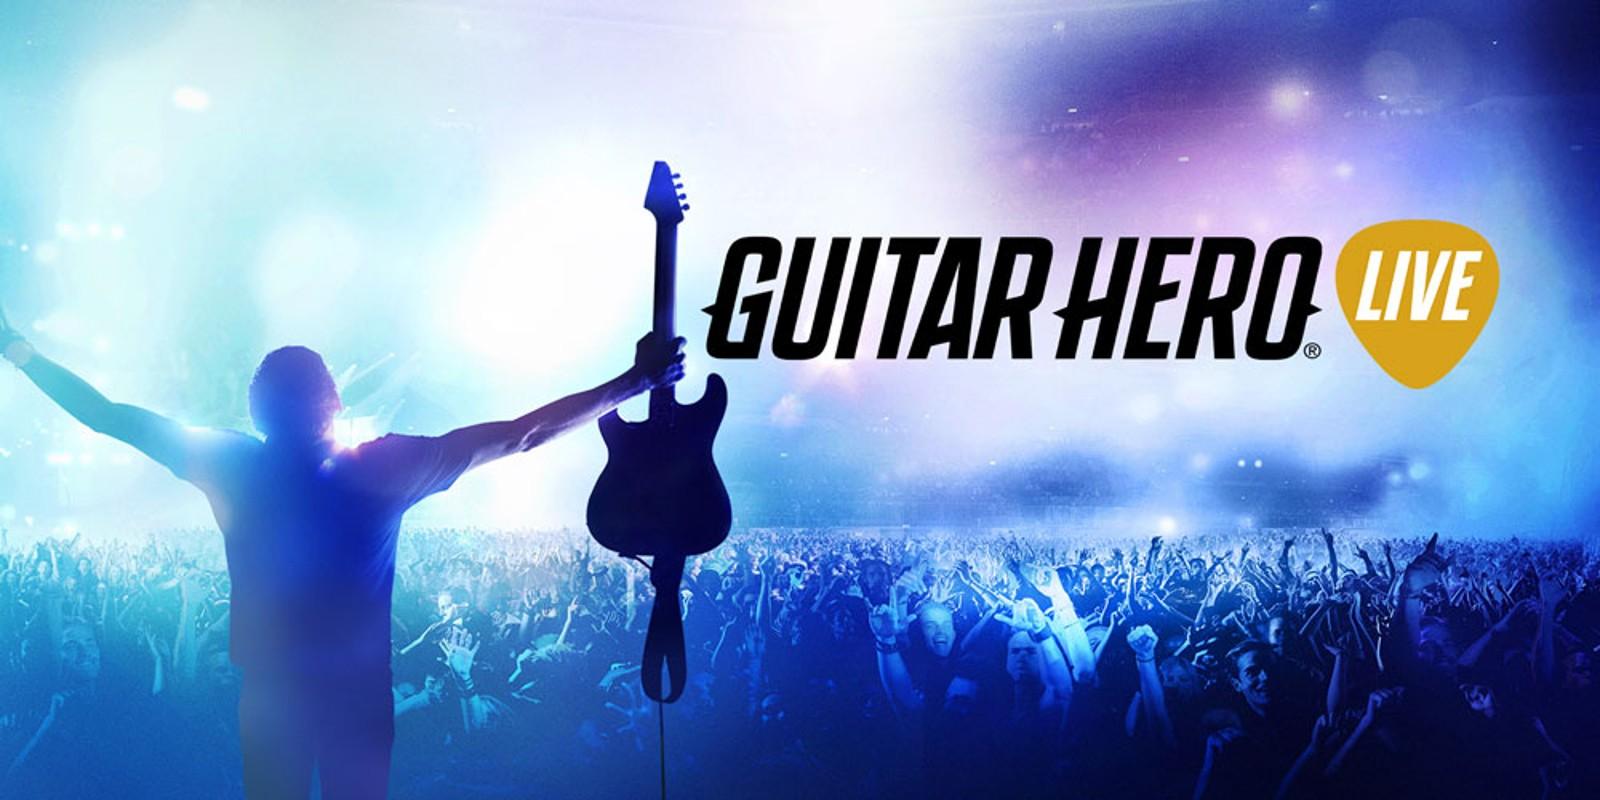 guitar hero live wii u games nintendo